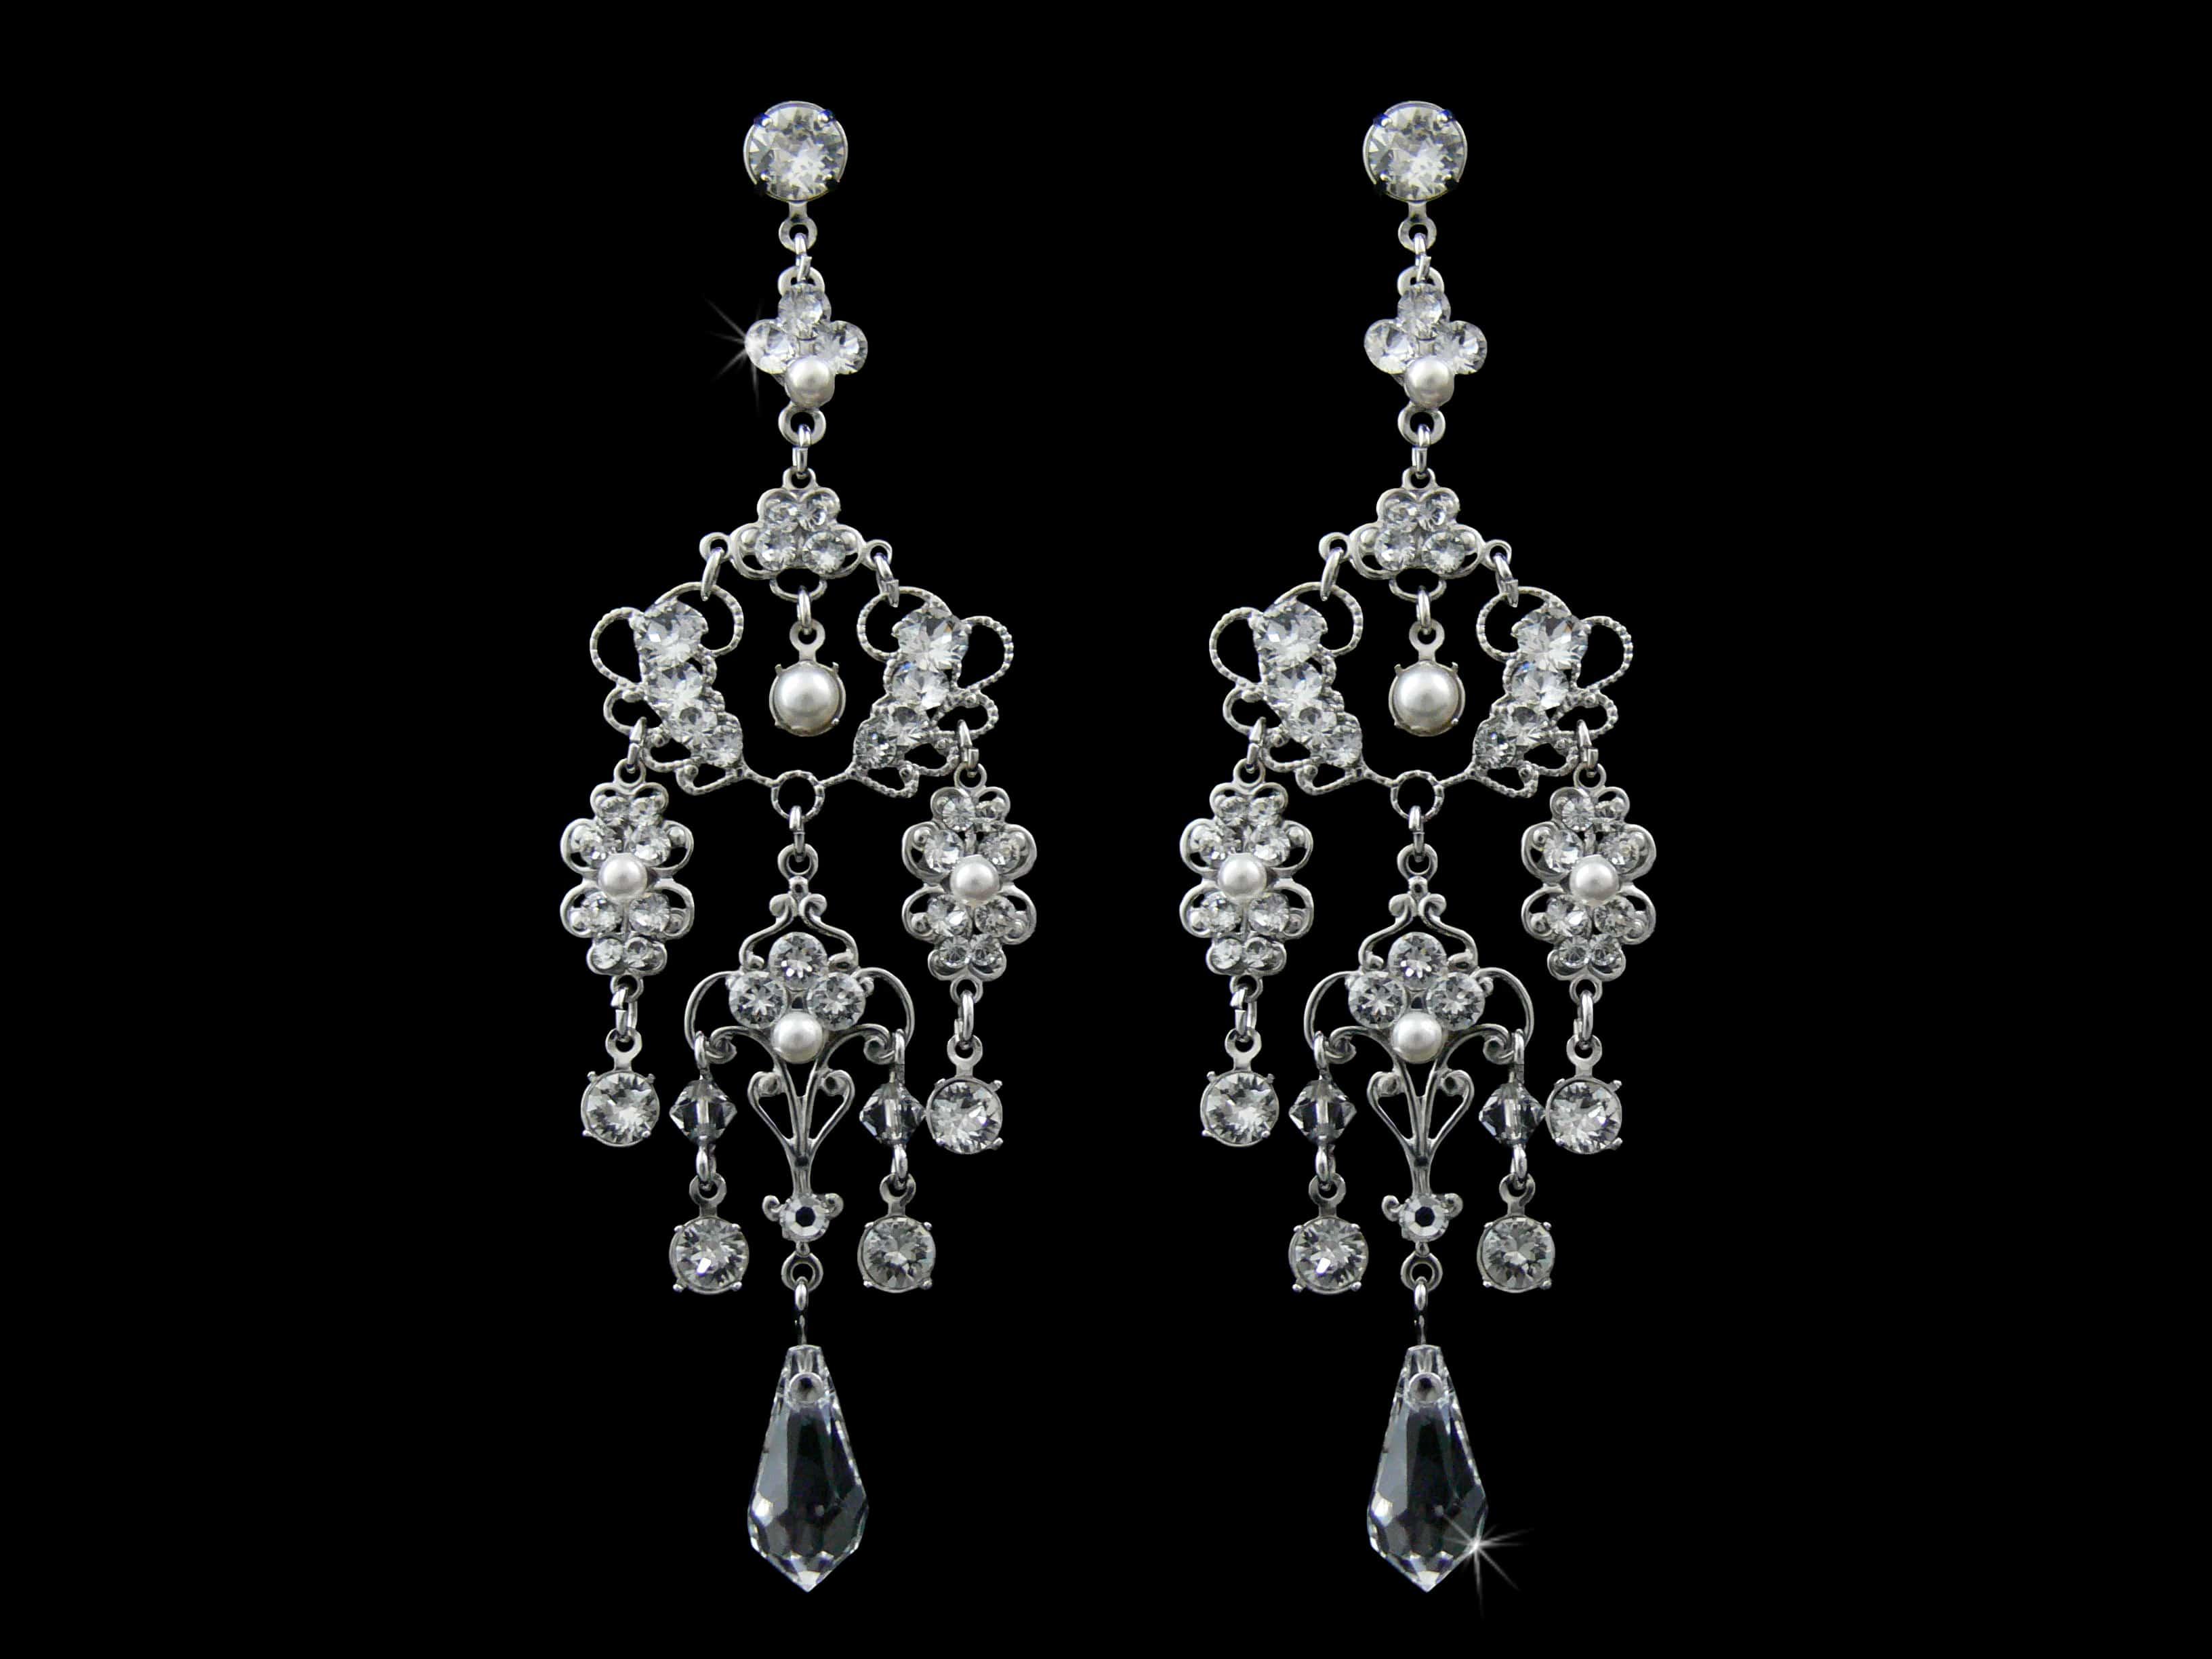 Beyonce Chandelier Earrings from Vinka Design Bridal Accessories